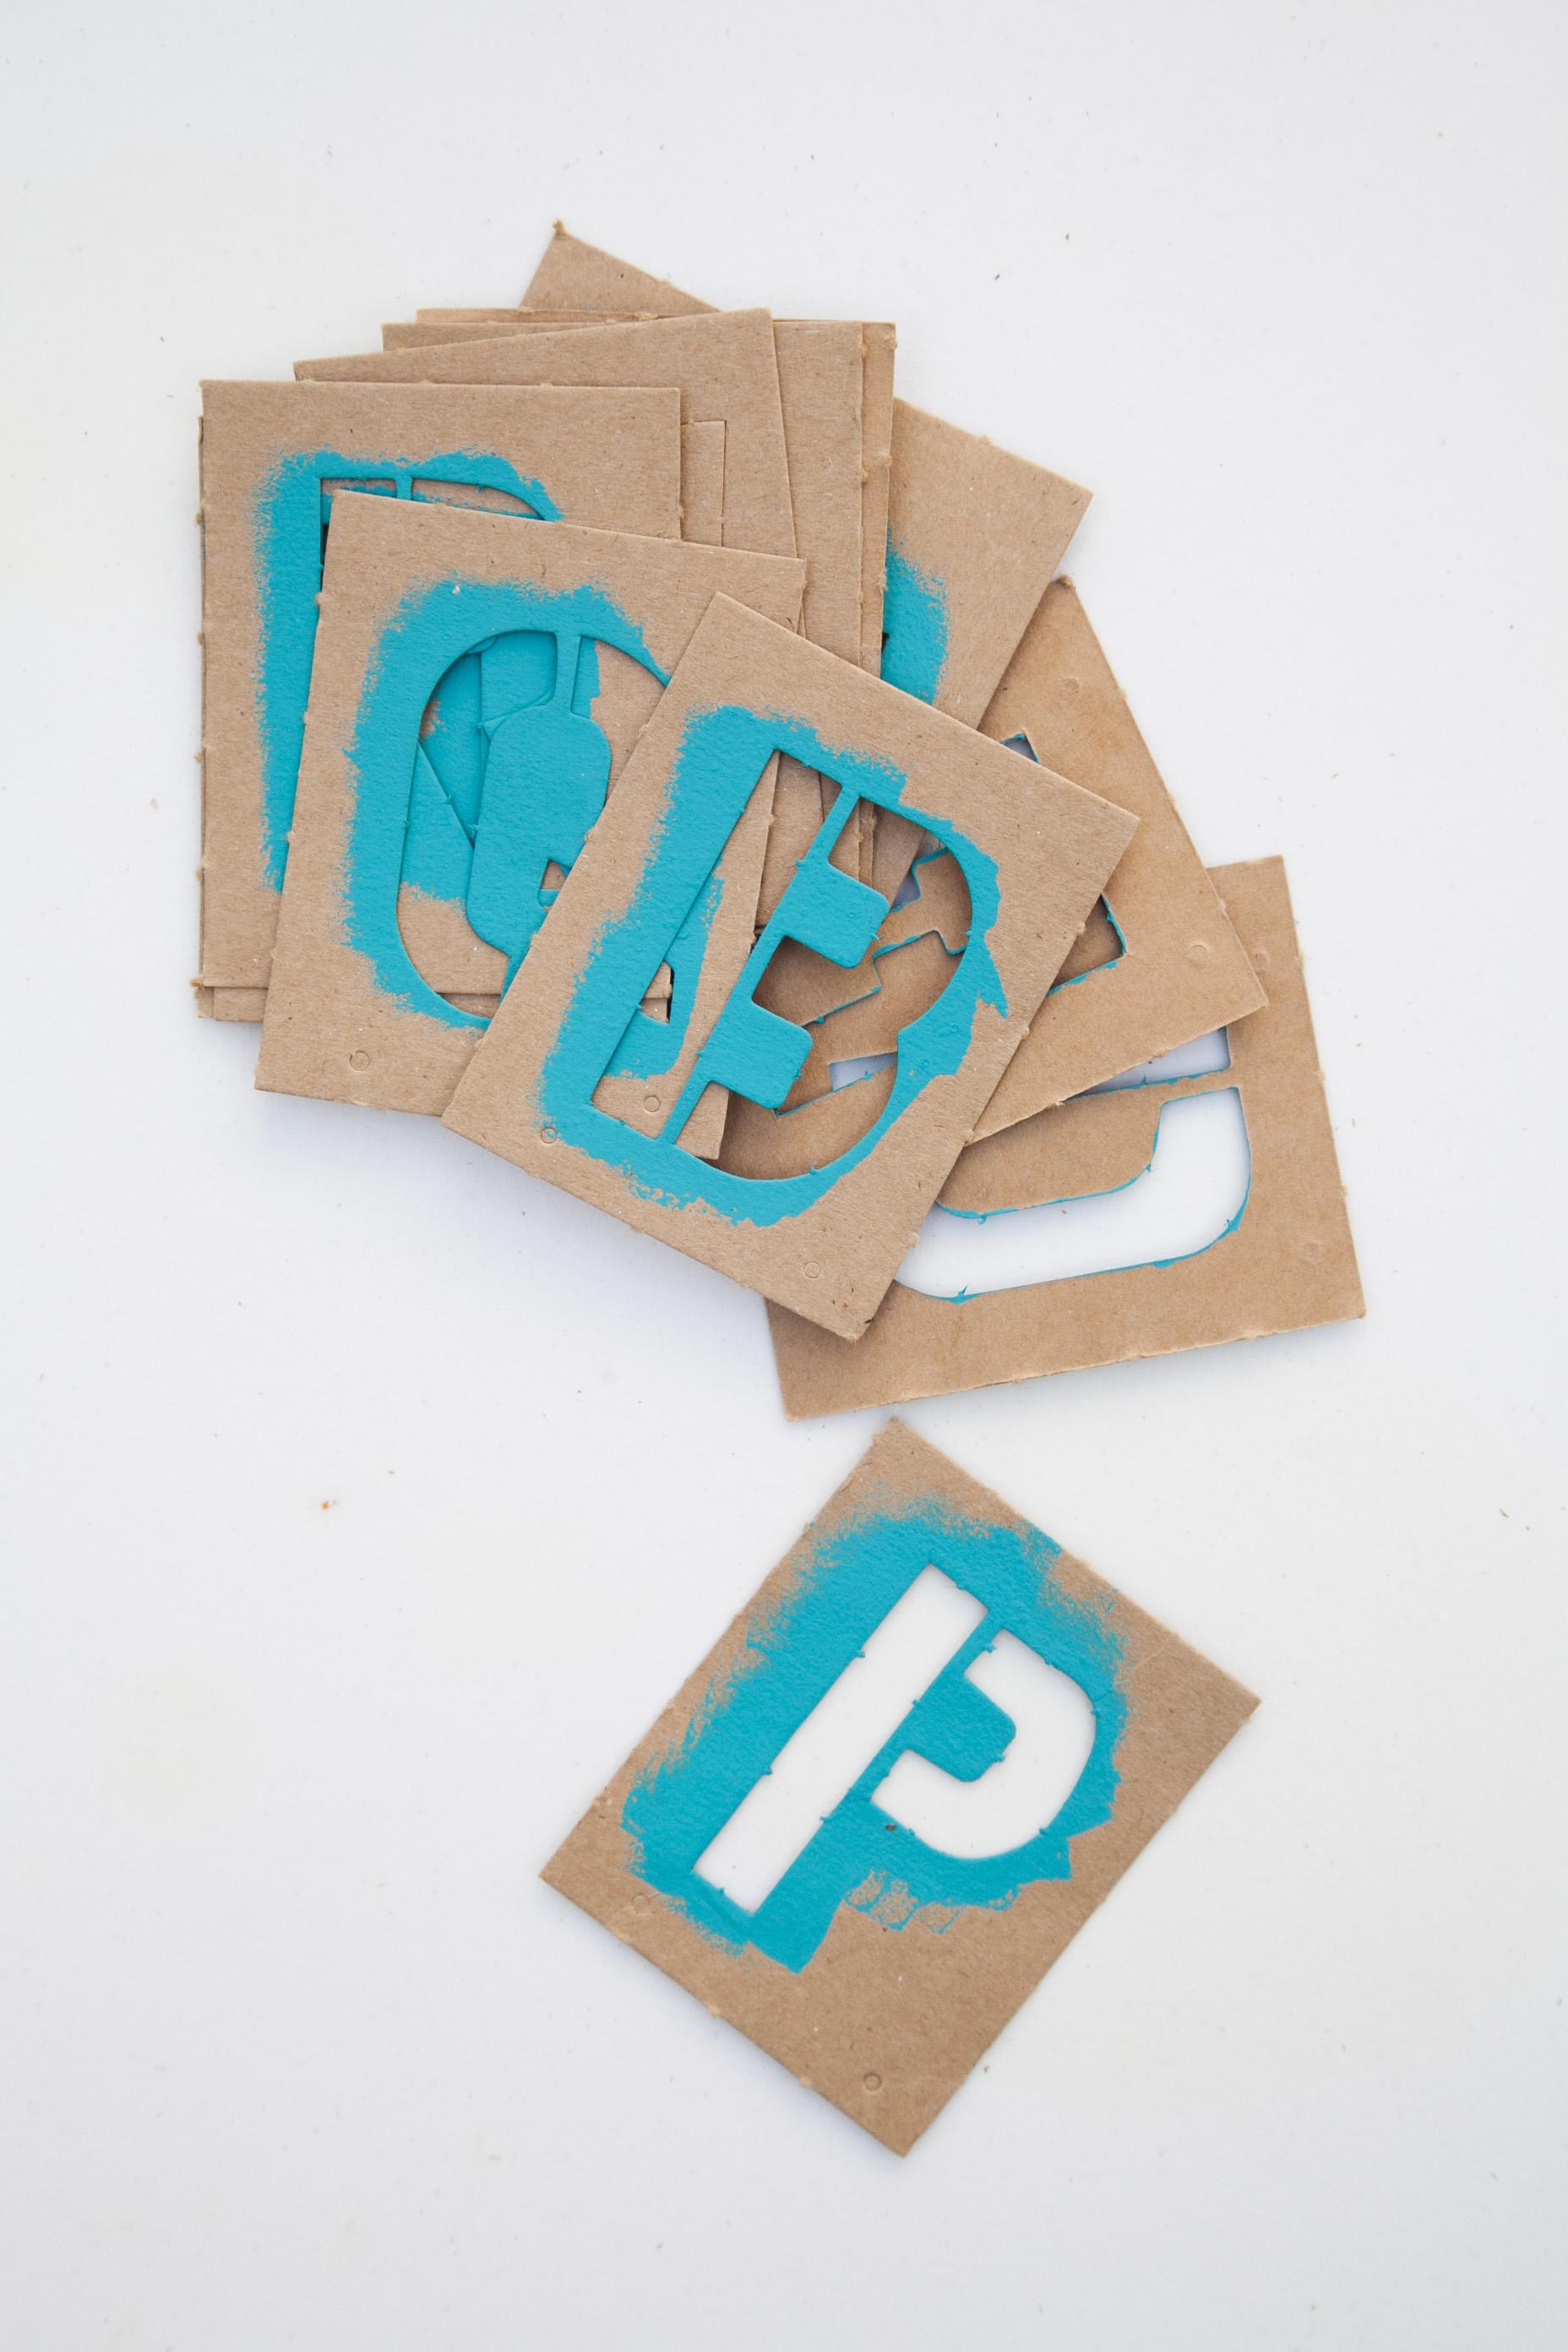 Hardware Store Letter Stencils